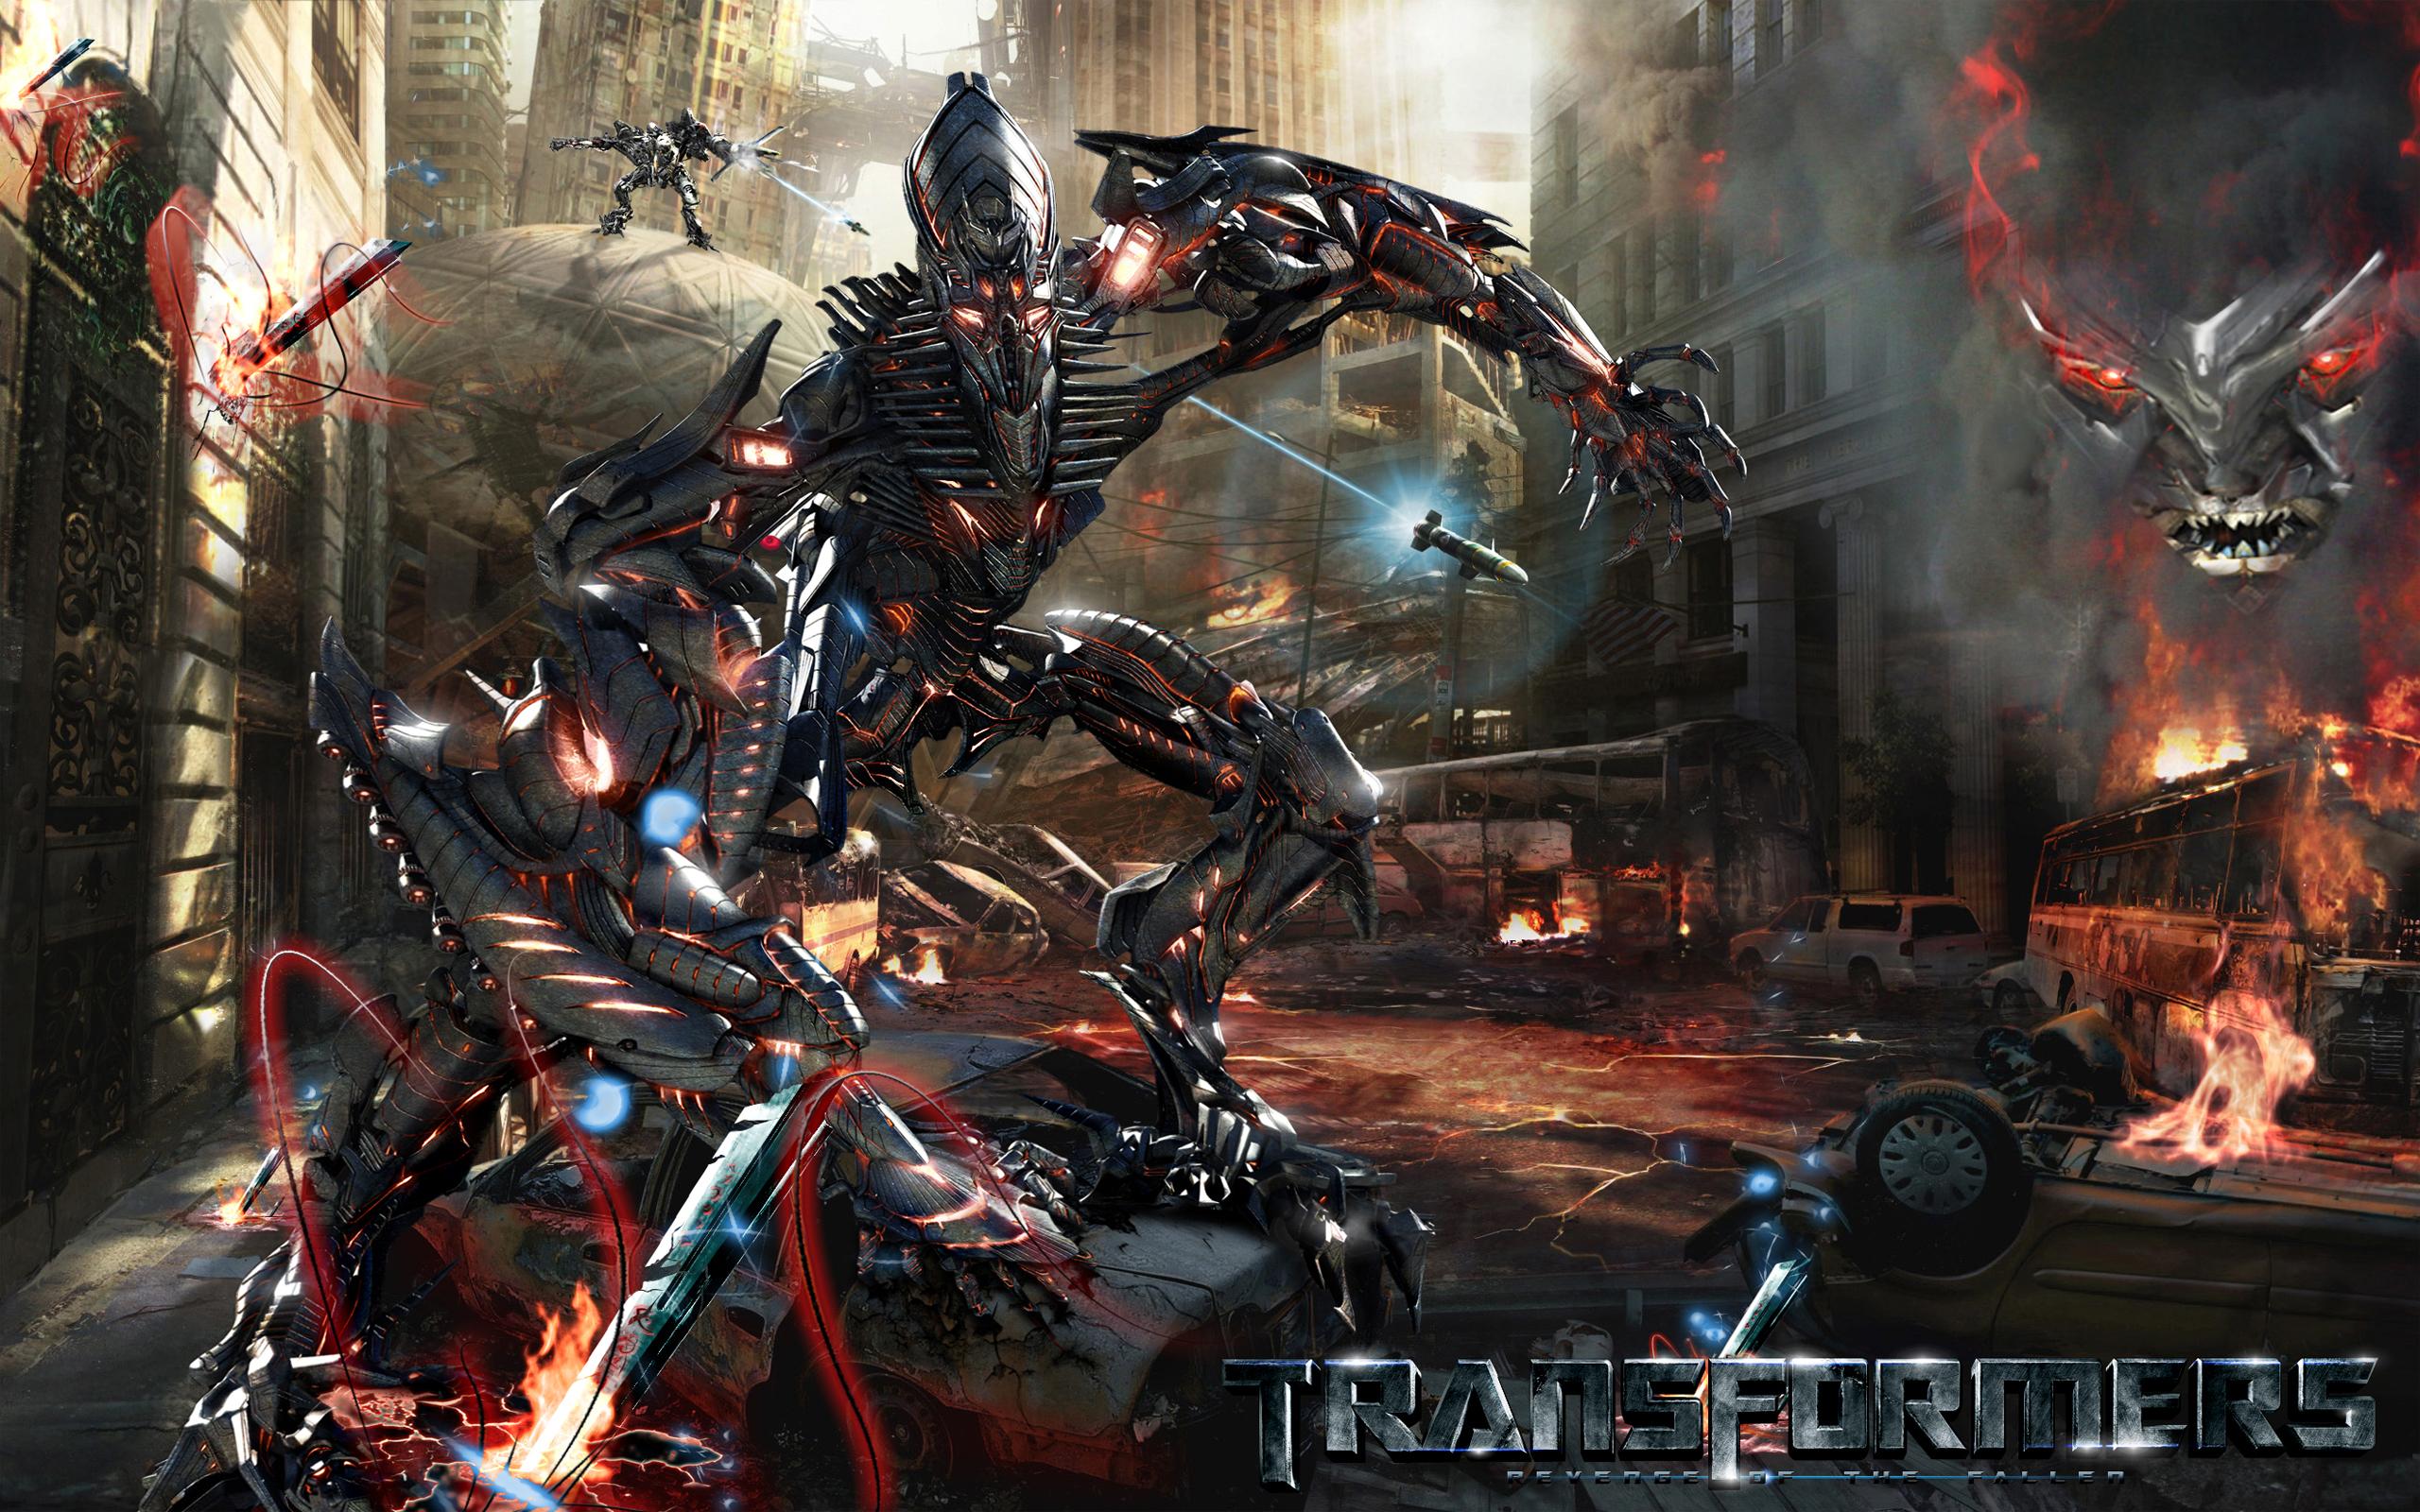 Cool Decepticon Transformers 4 Wallpaper Image 4612 Wallpaper High 2560x1600